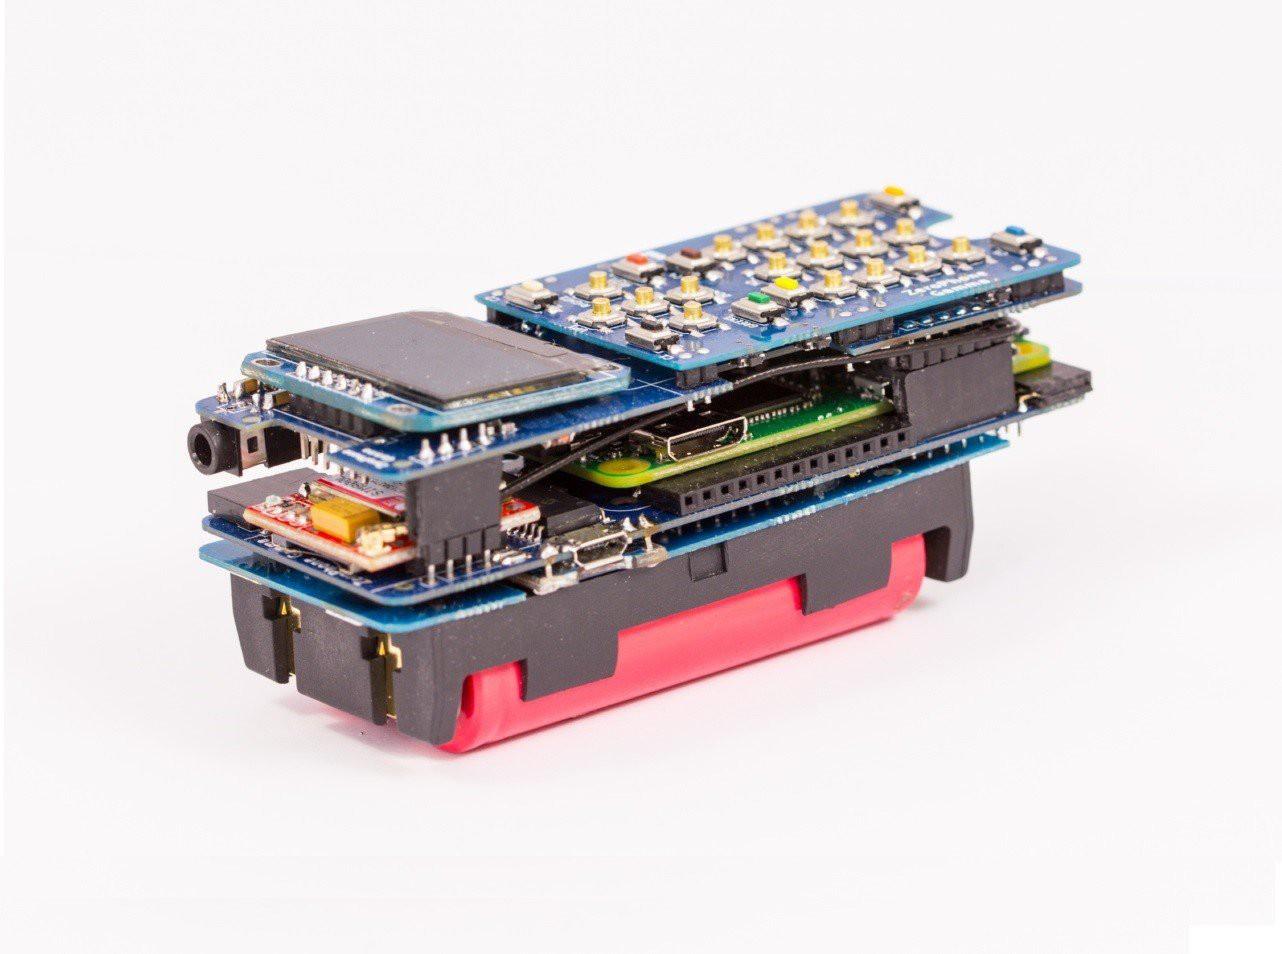 SIM800 - Hardware bazaar - Hiveeyes